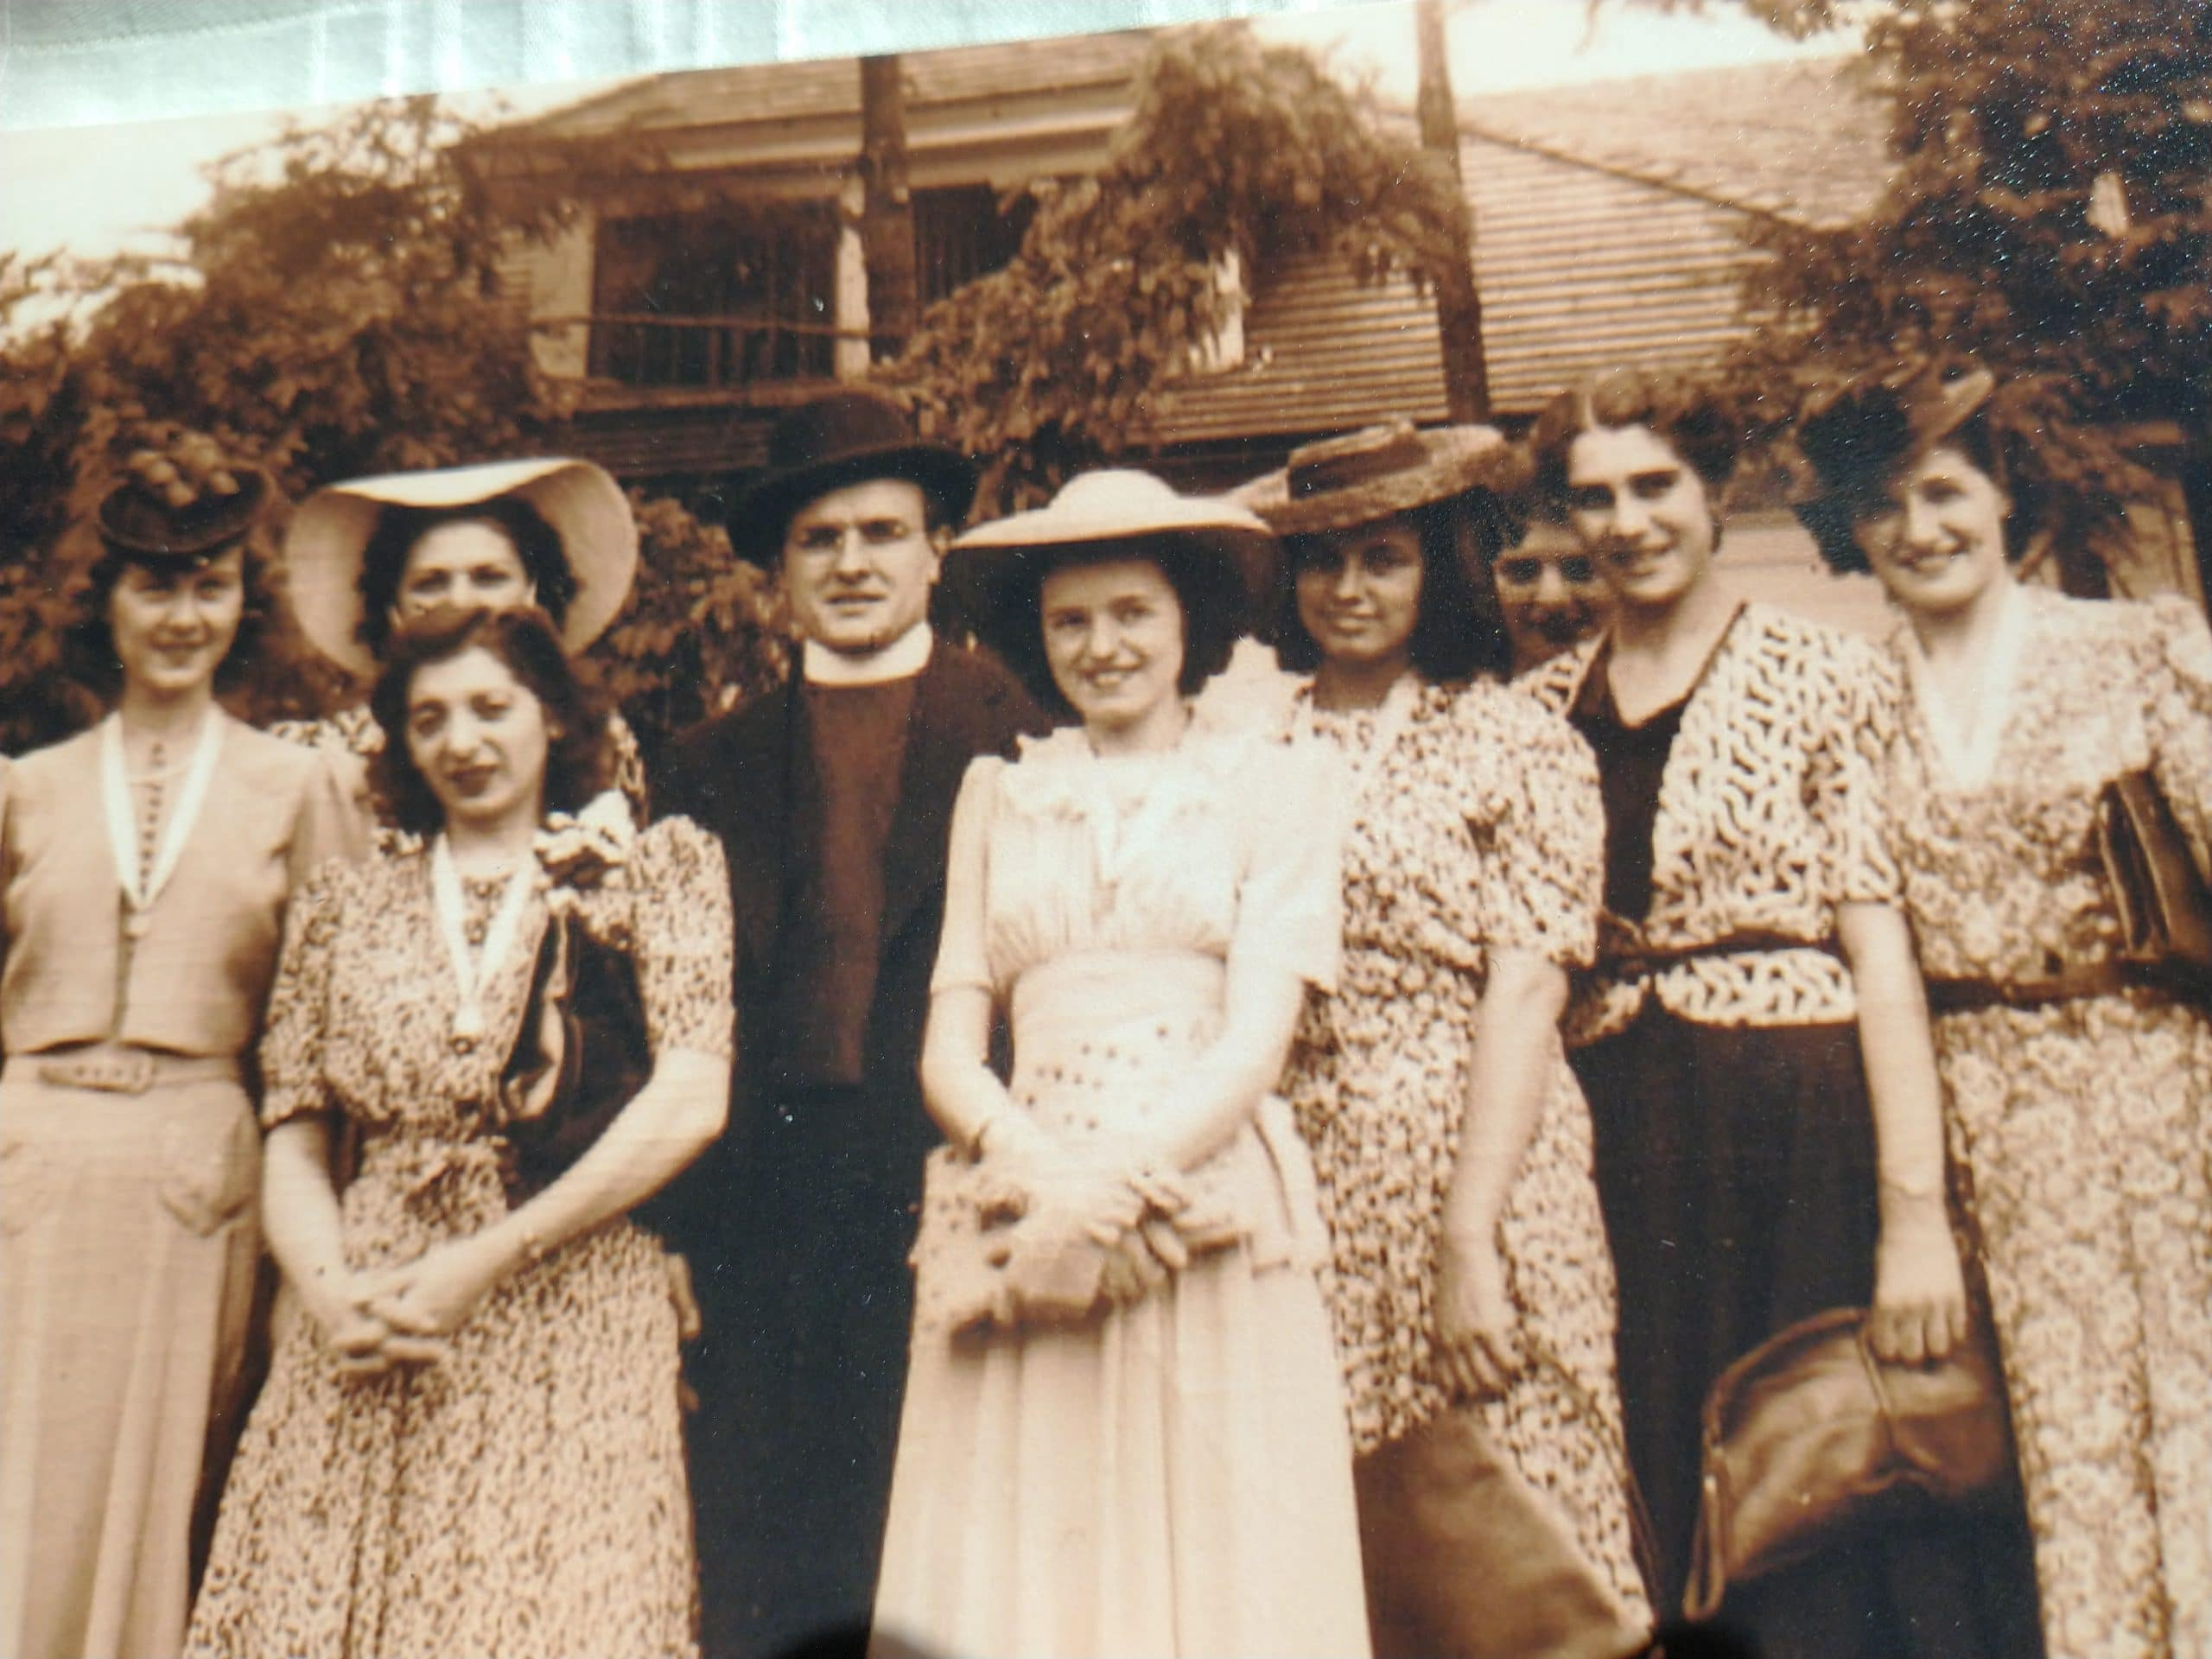 Lady's Sodality, outside Pfaff's Restaurant, Metuchen, NJ, June 12, 1938